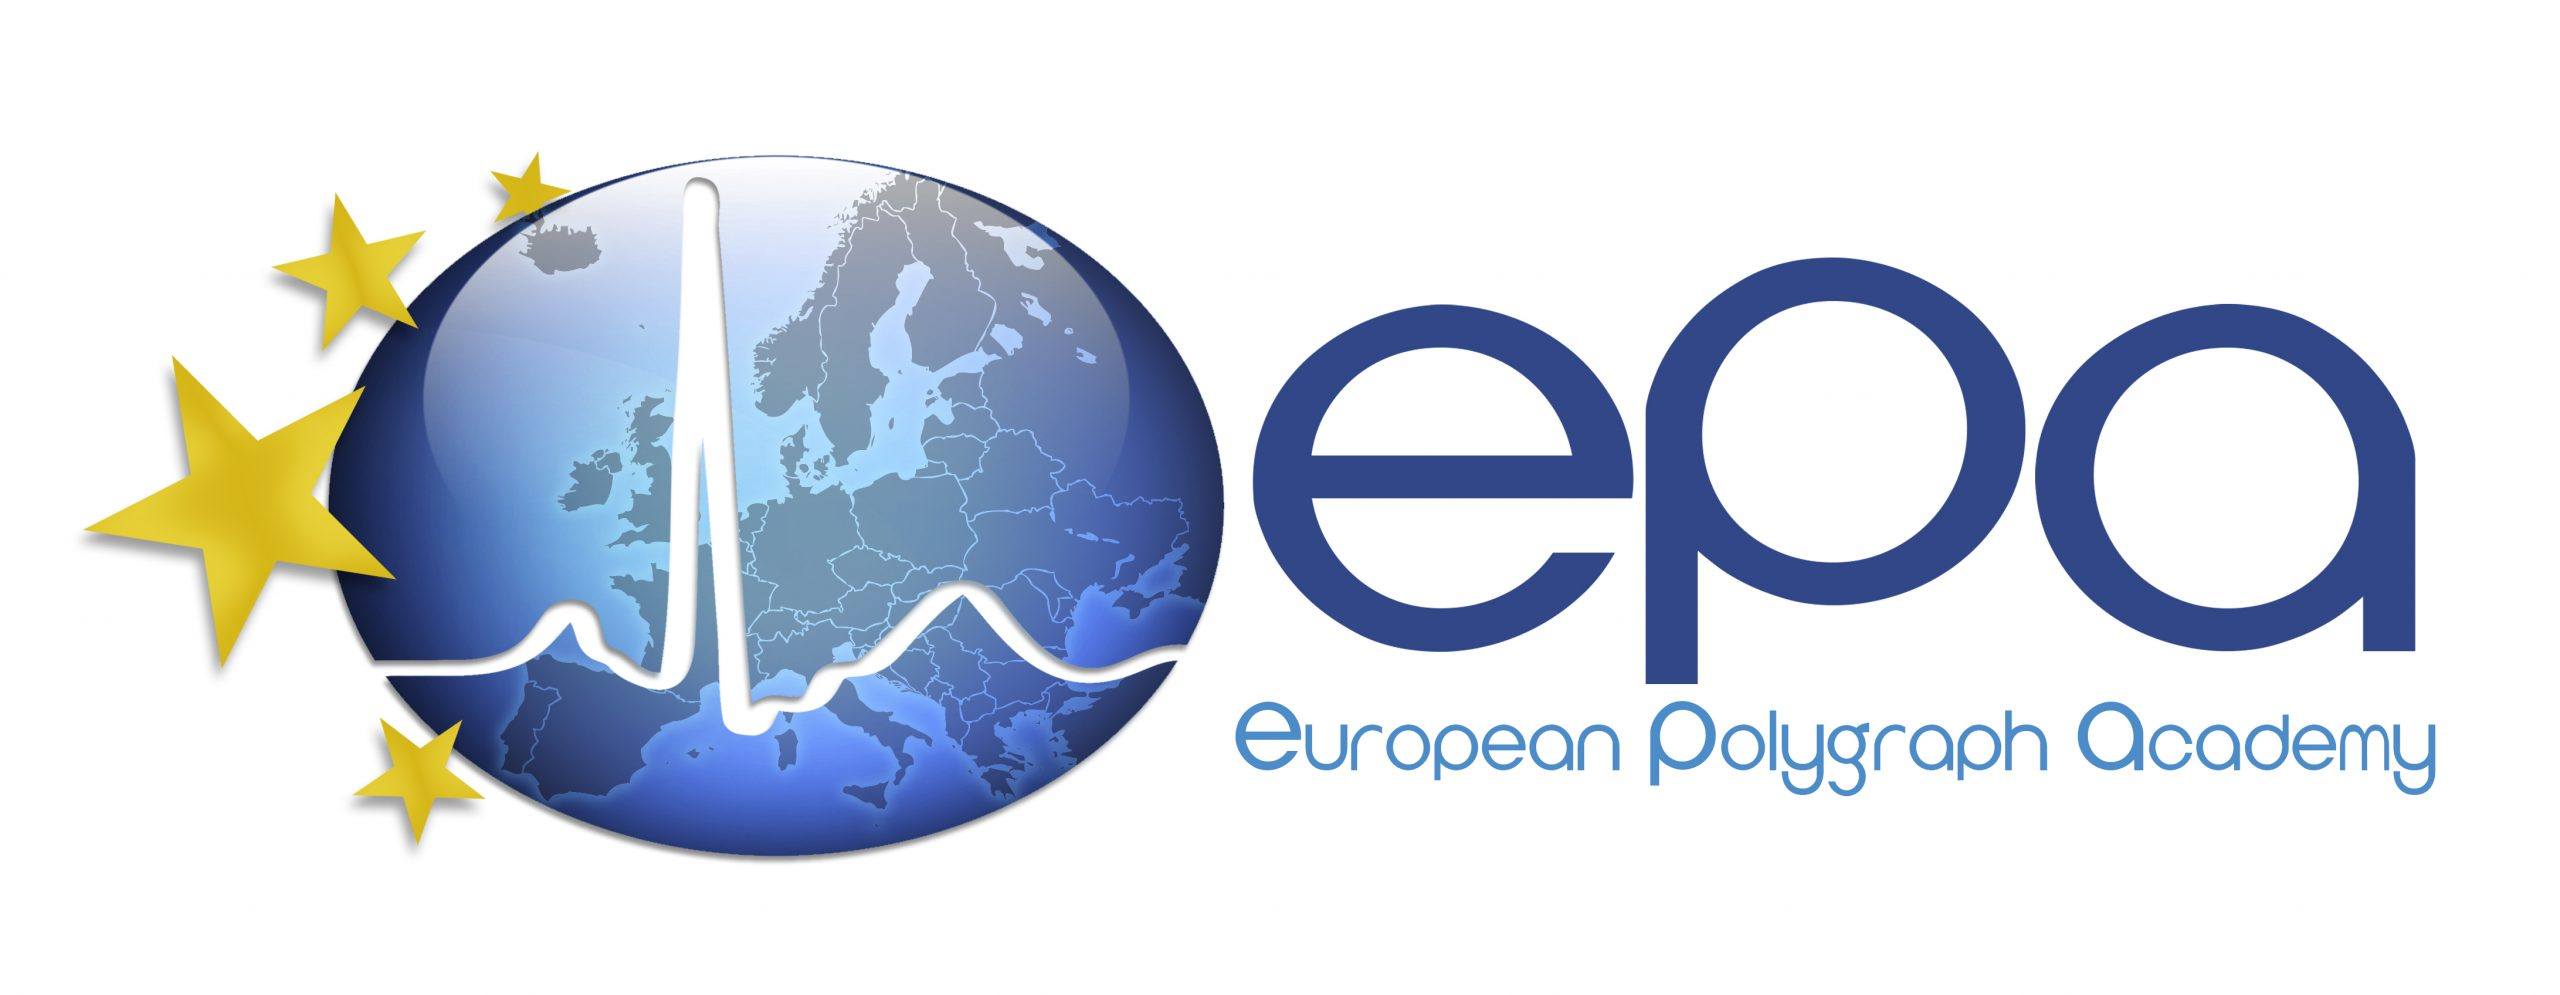 European Polygraph Academy EPA